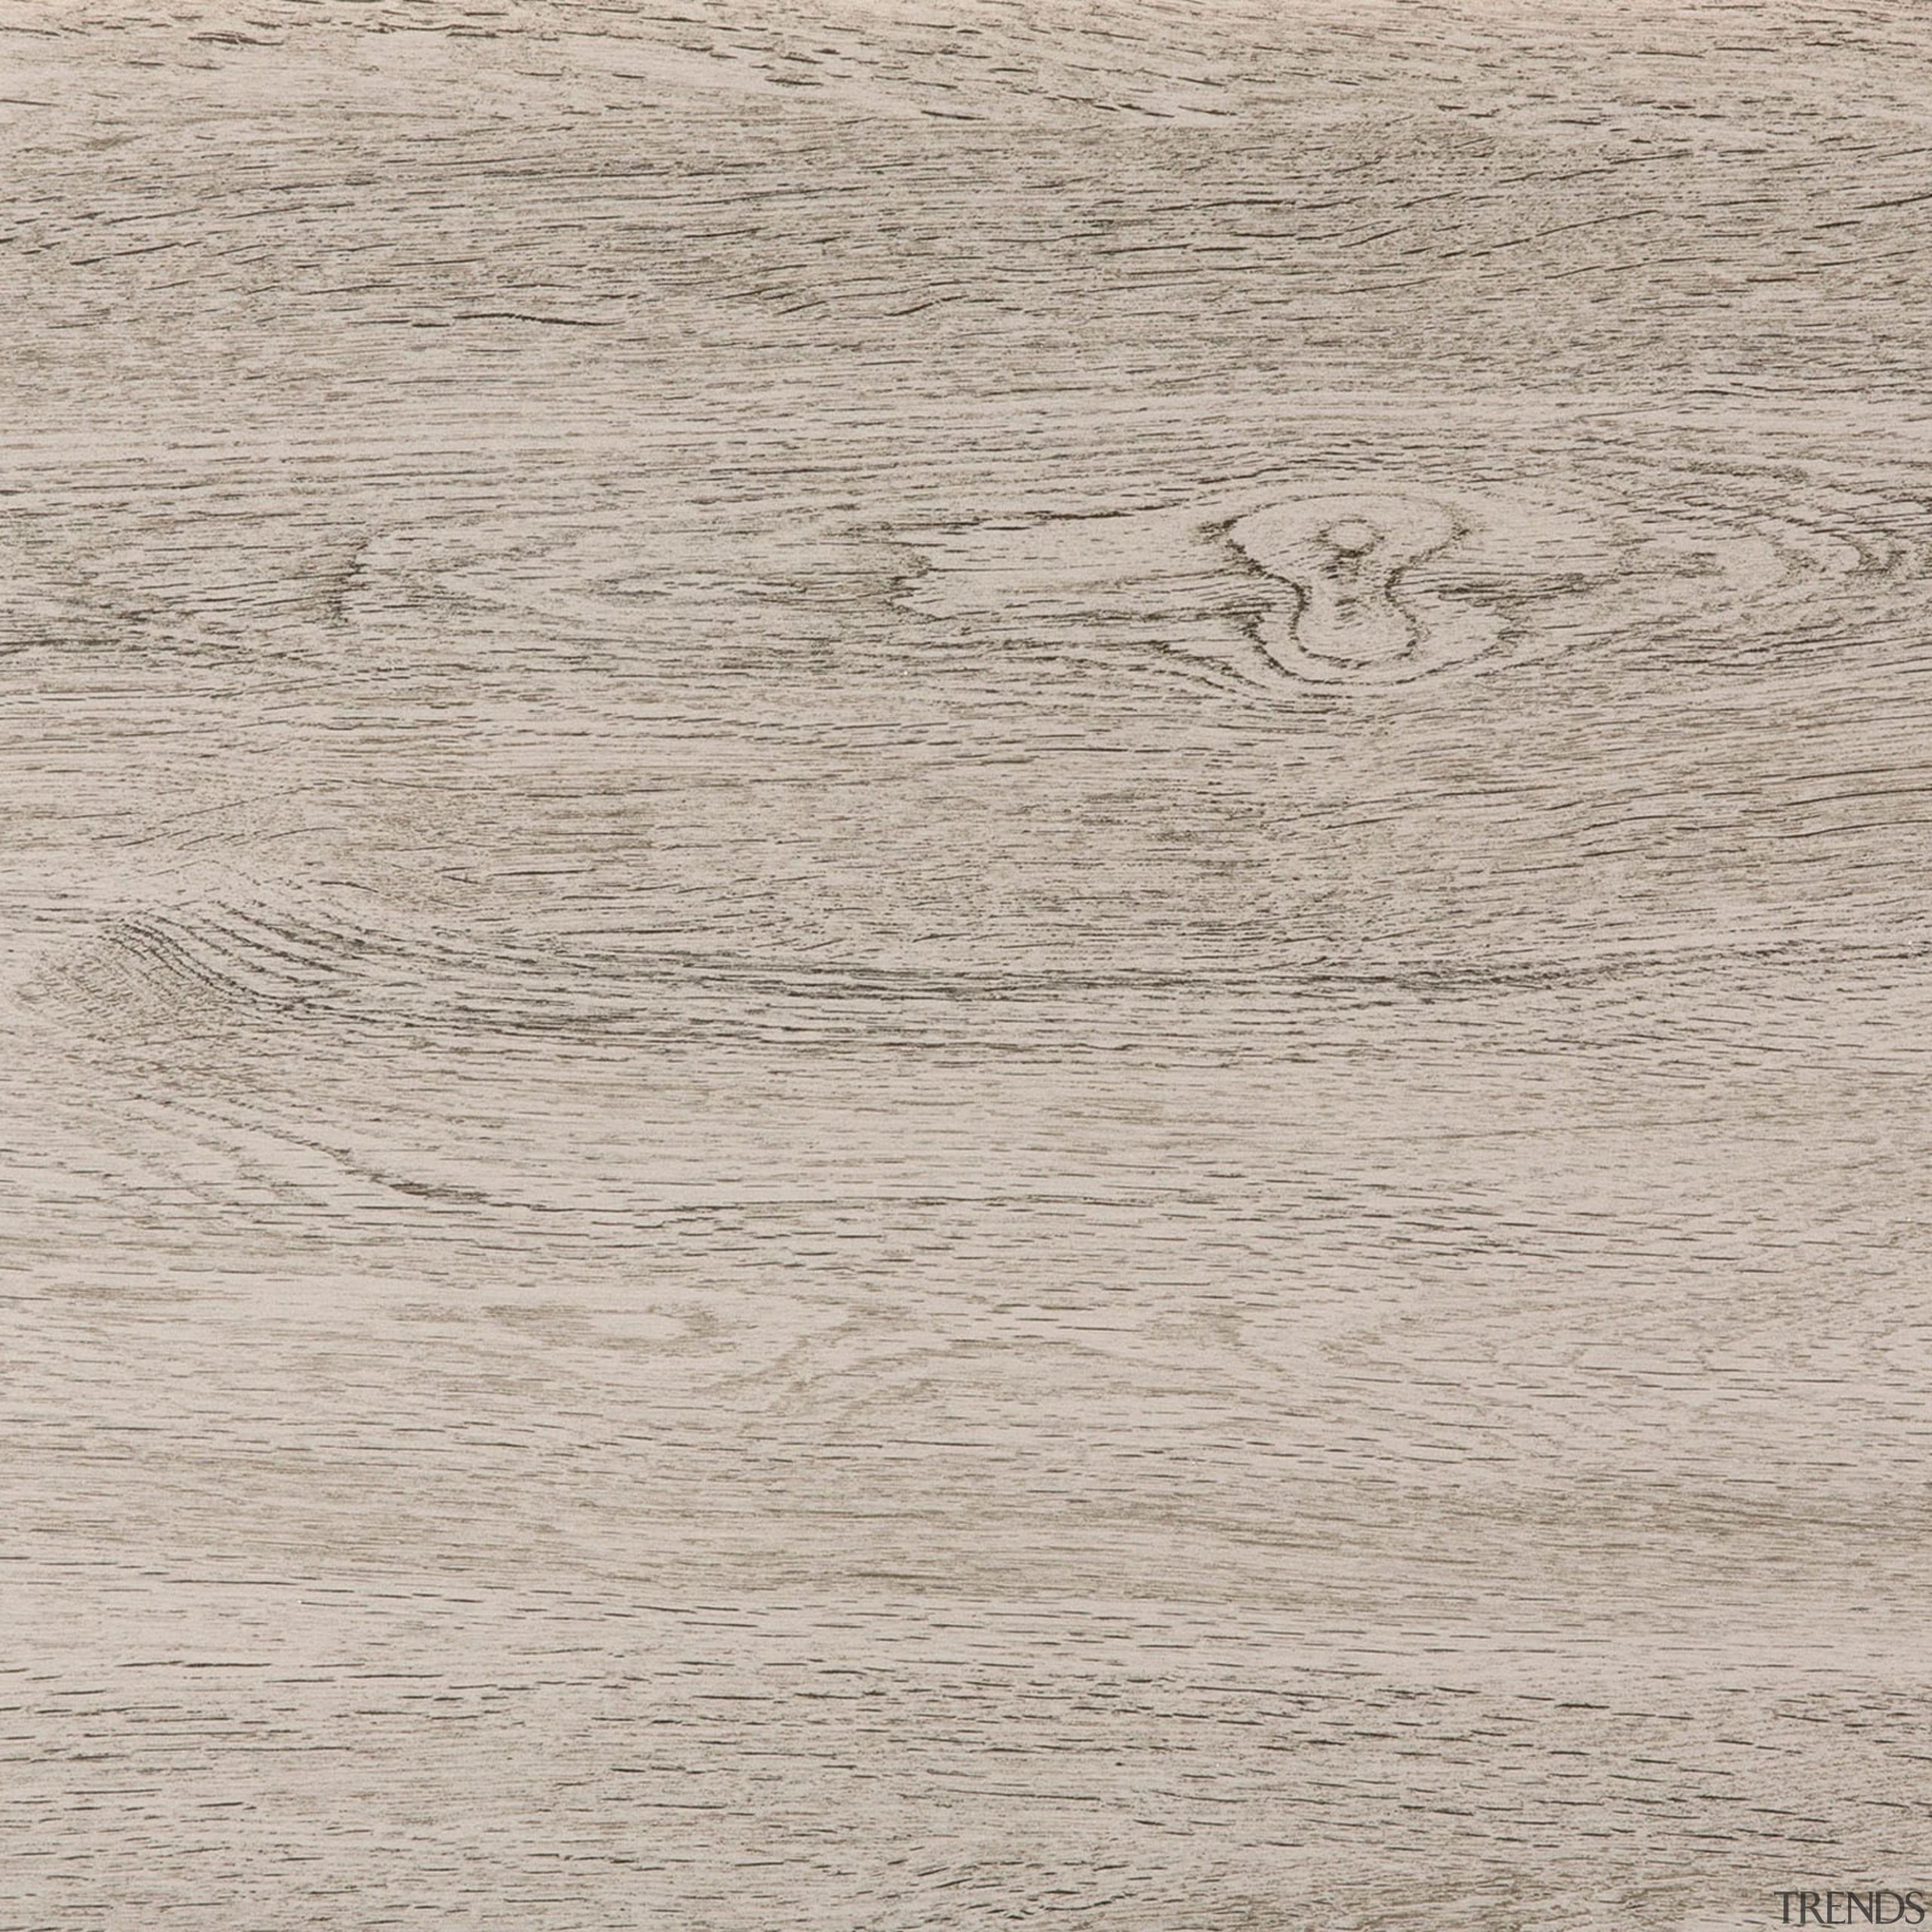 Dekton - texture   wood   gray texture, wood, gray